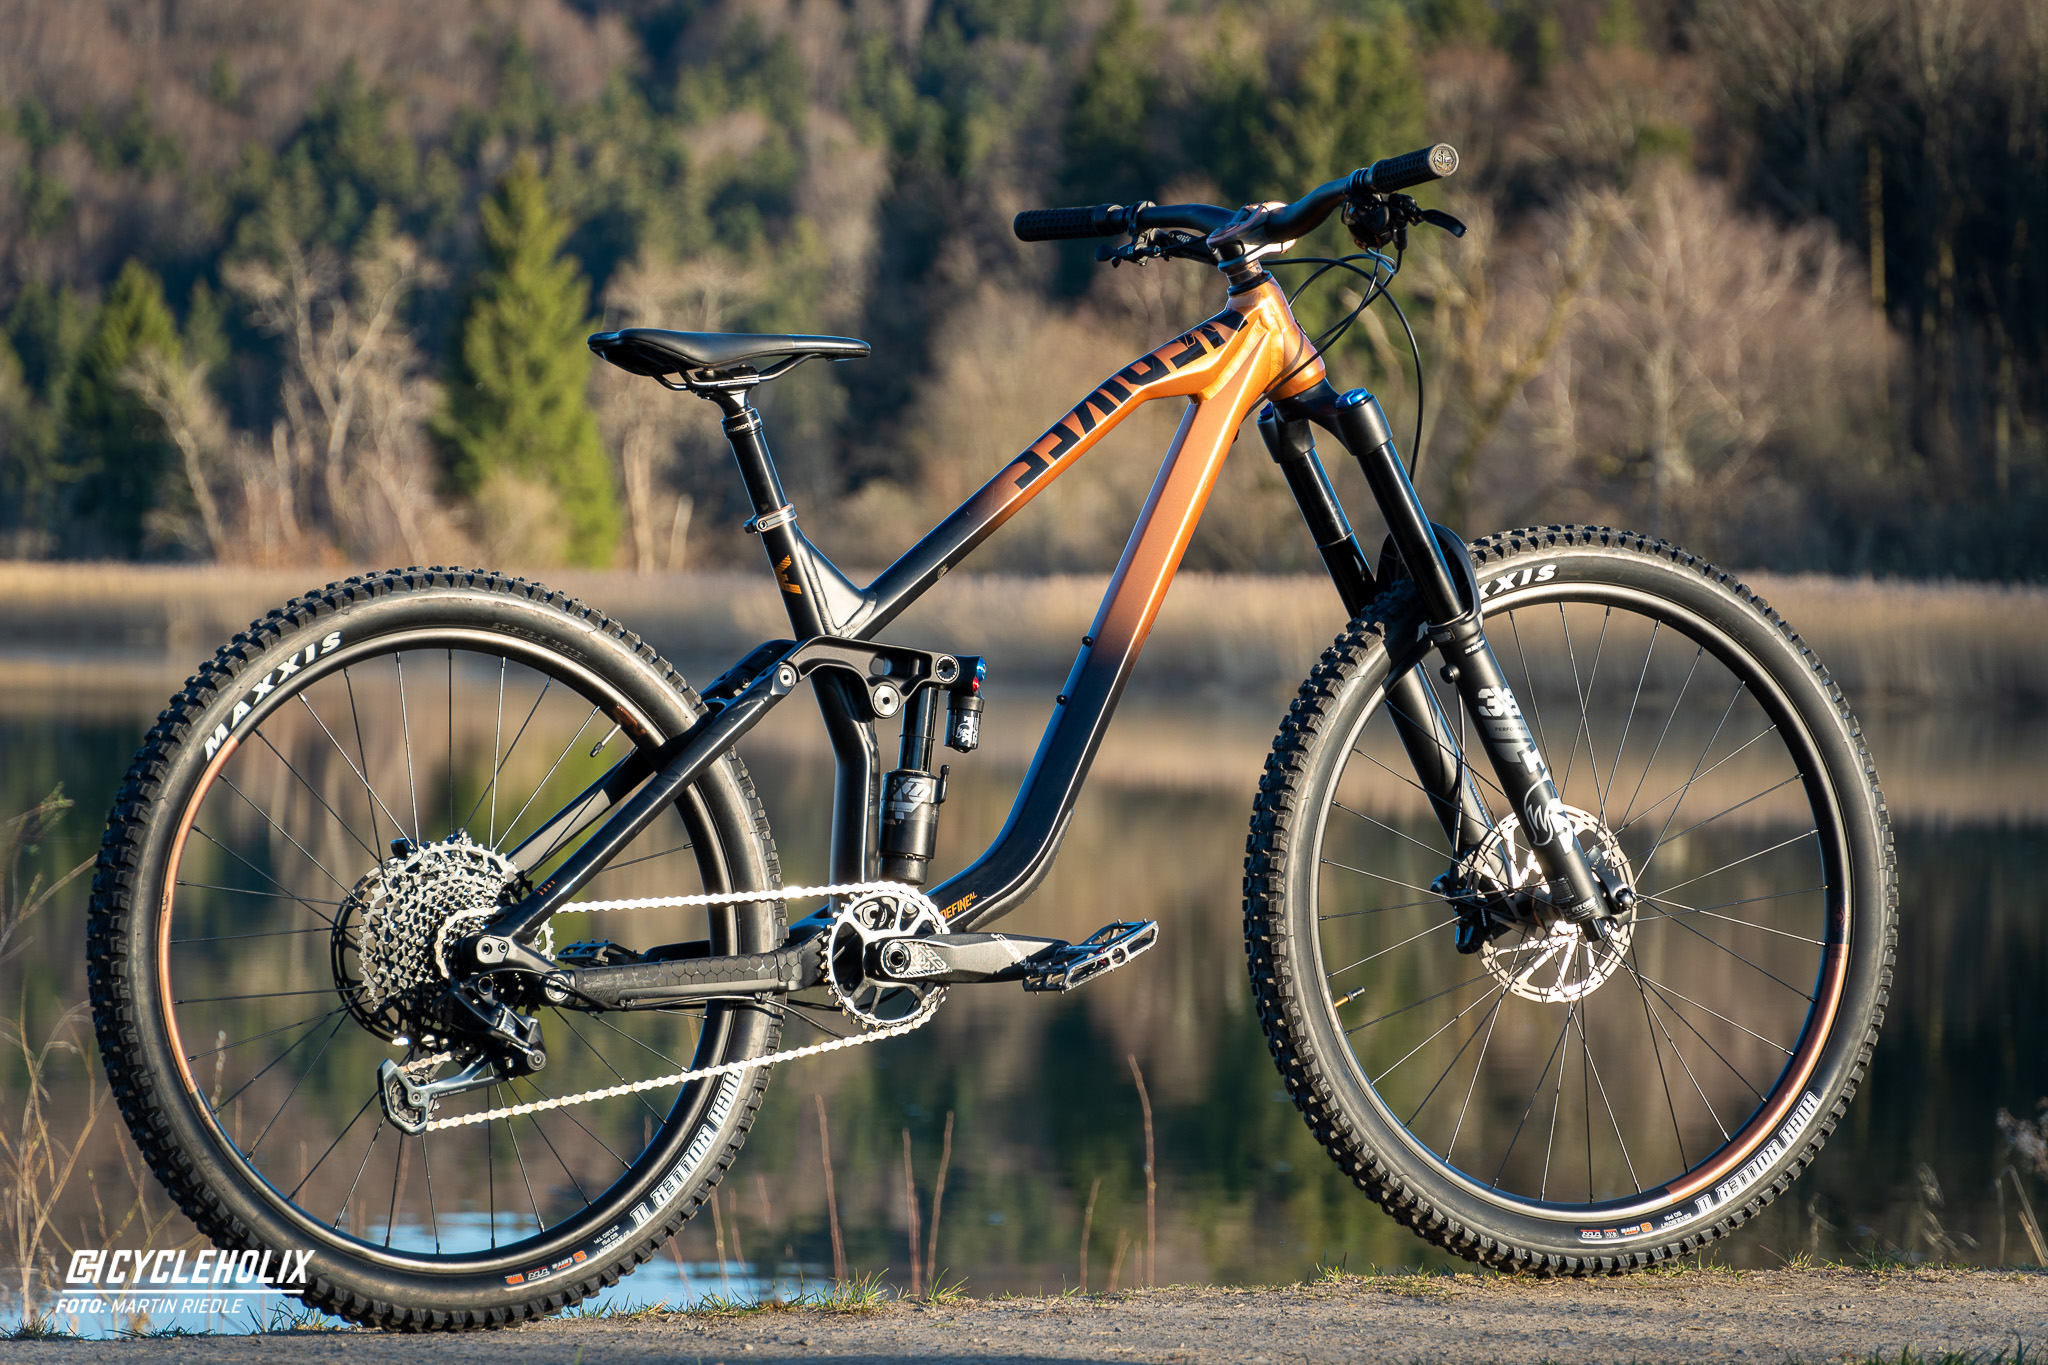 2021 NS Bikes Define 170 1 Cycleholix